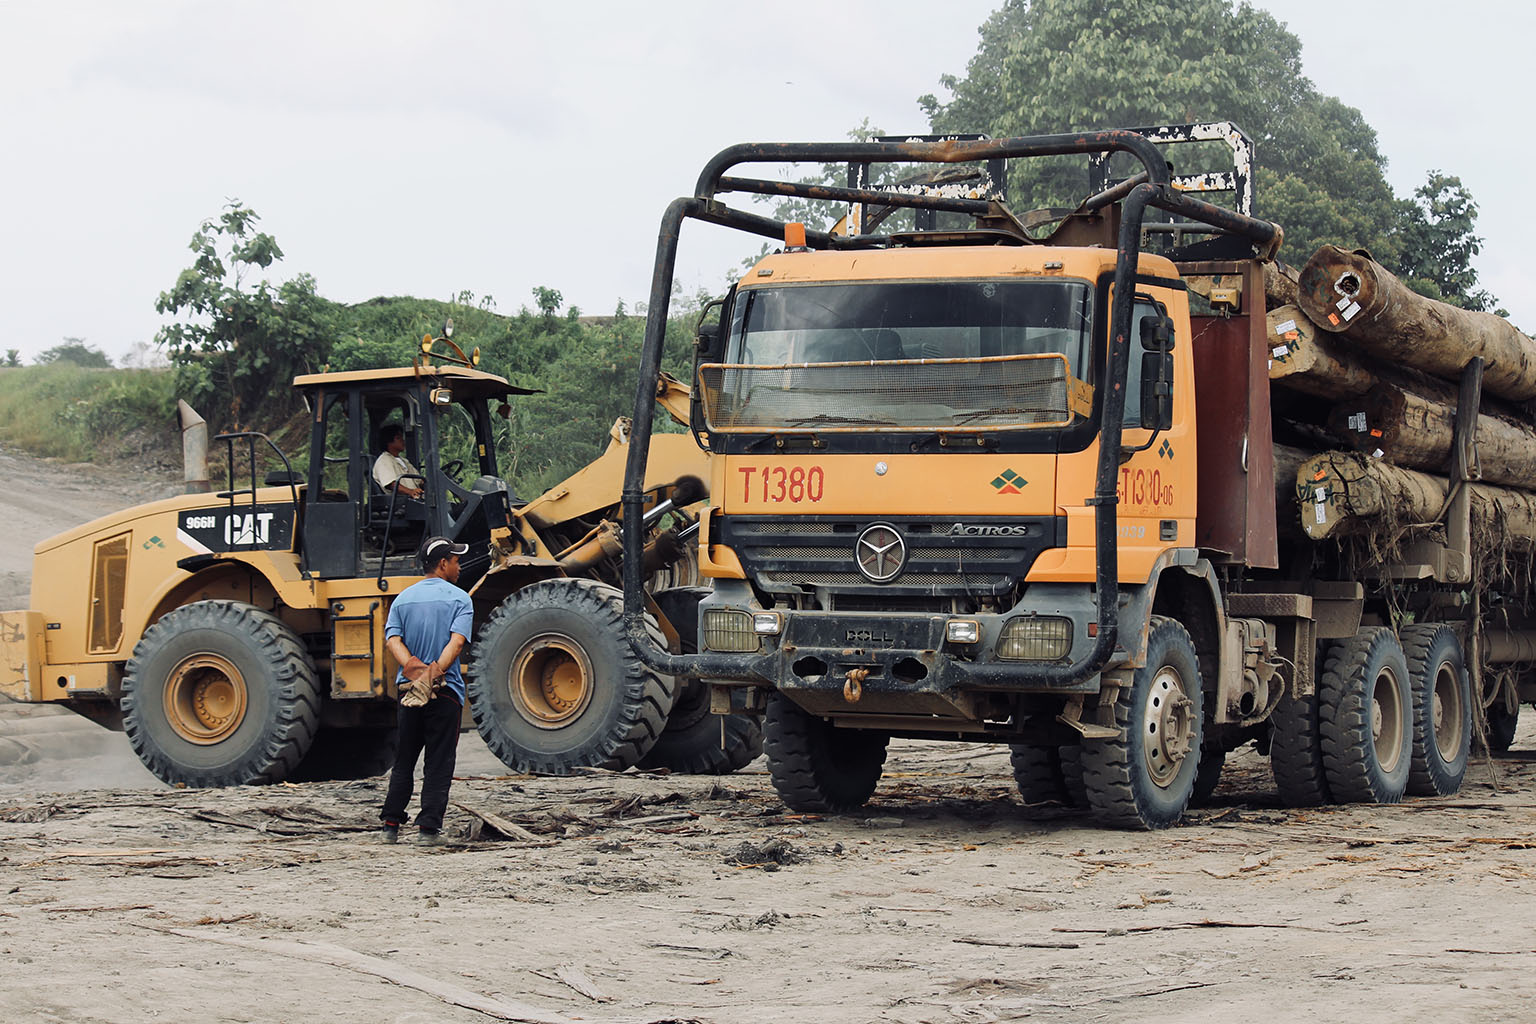 Samling logging trucks in the Baram region in July 2018. Photo credit: Fiona McAlpine of The Borneo Project